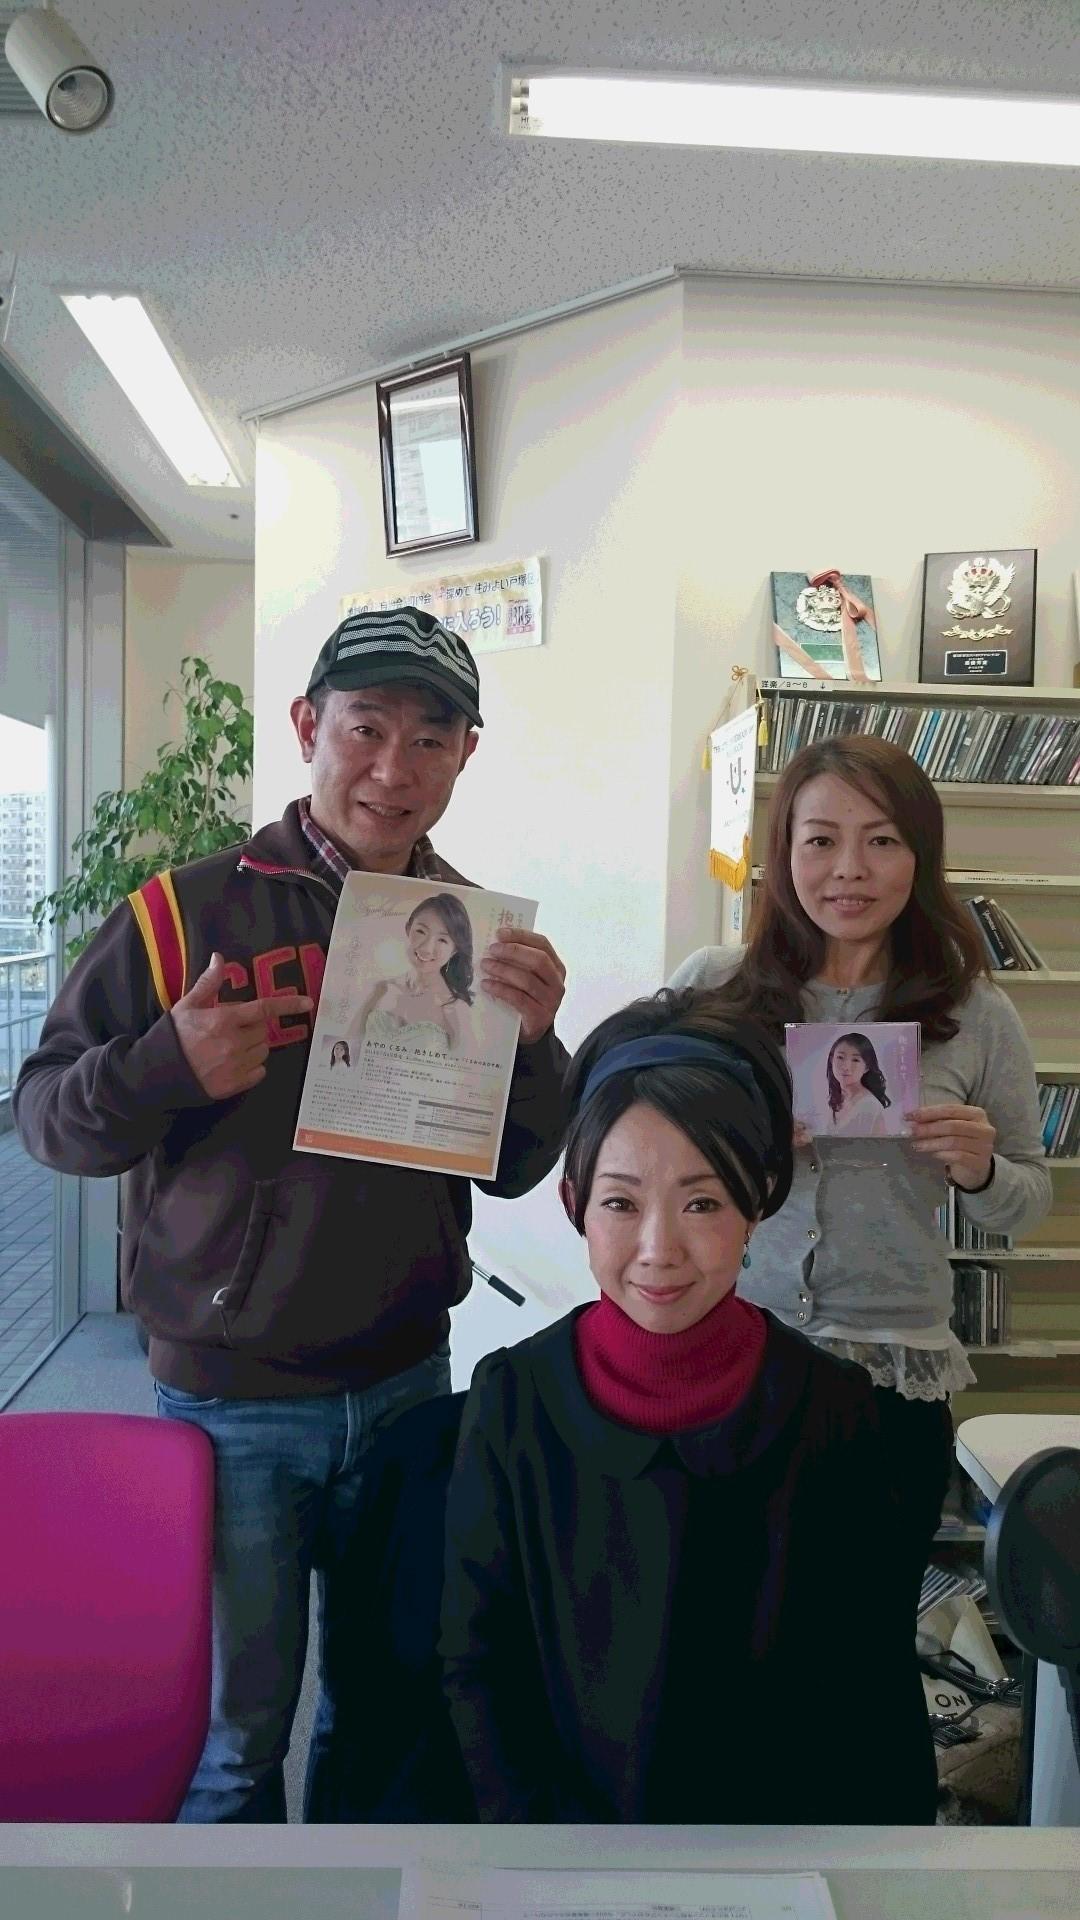 FM戸塚「モナオの歌う門には福来る」出演♪_f0165126_19274799.jpg